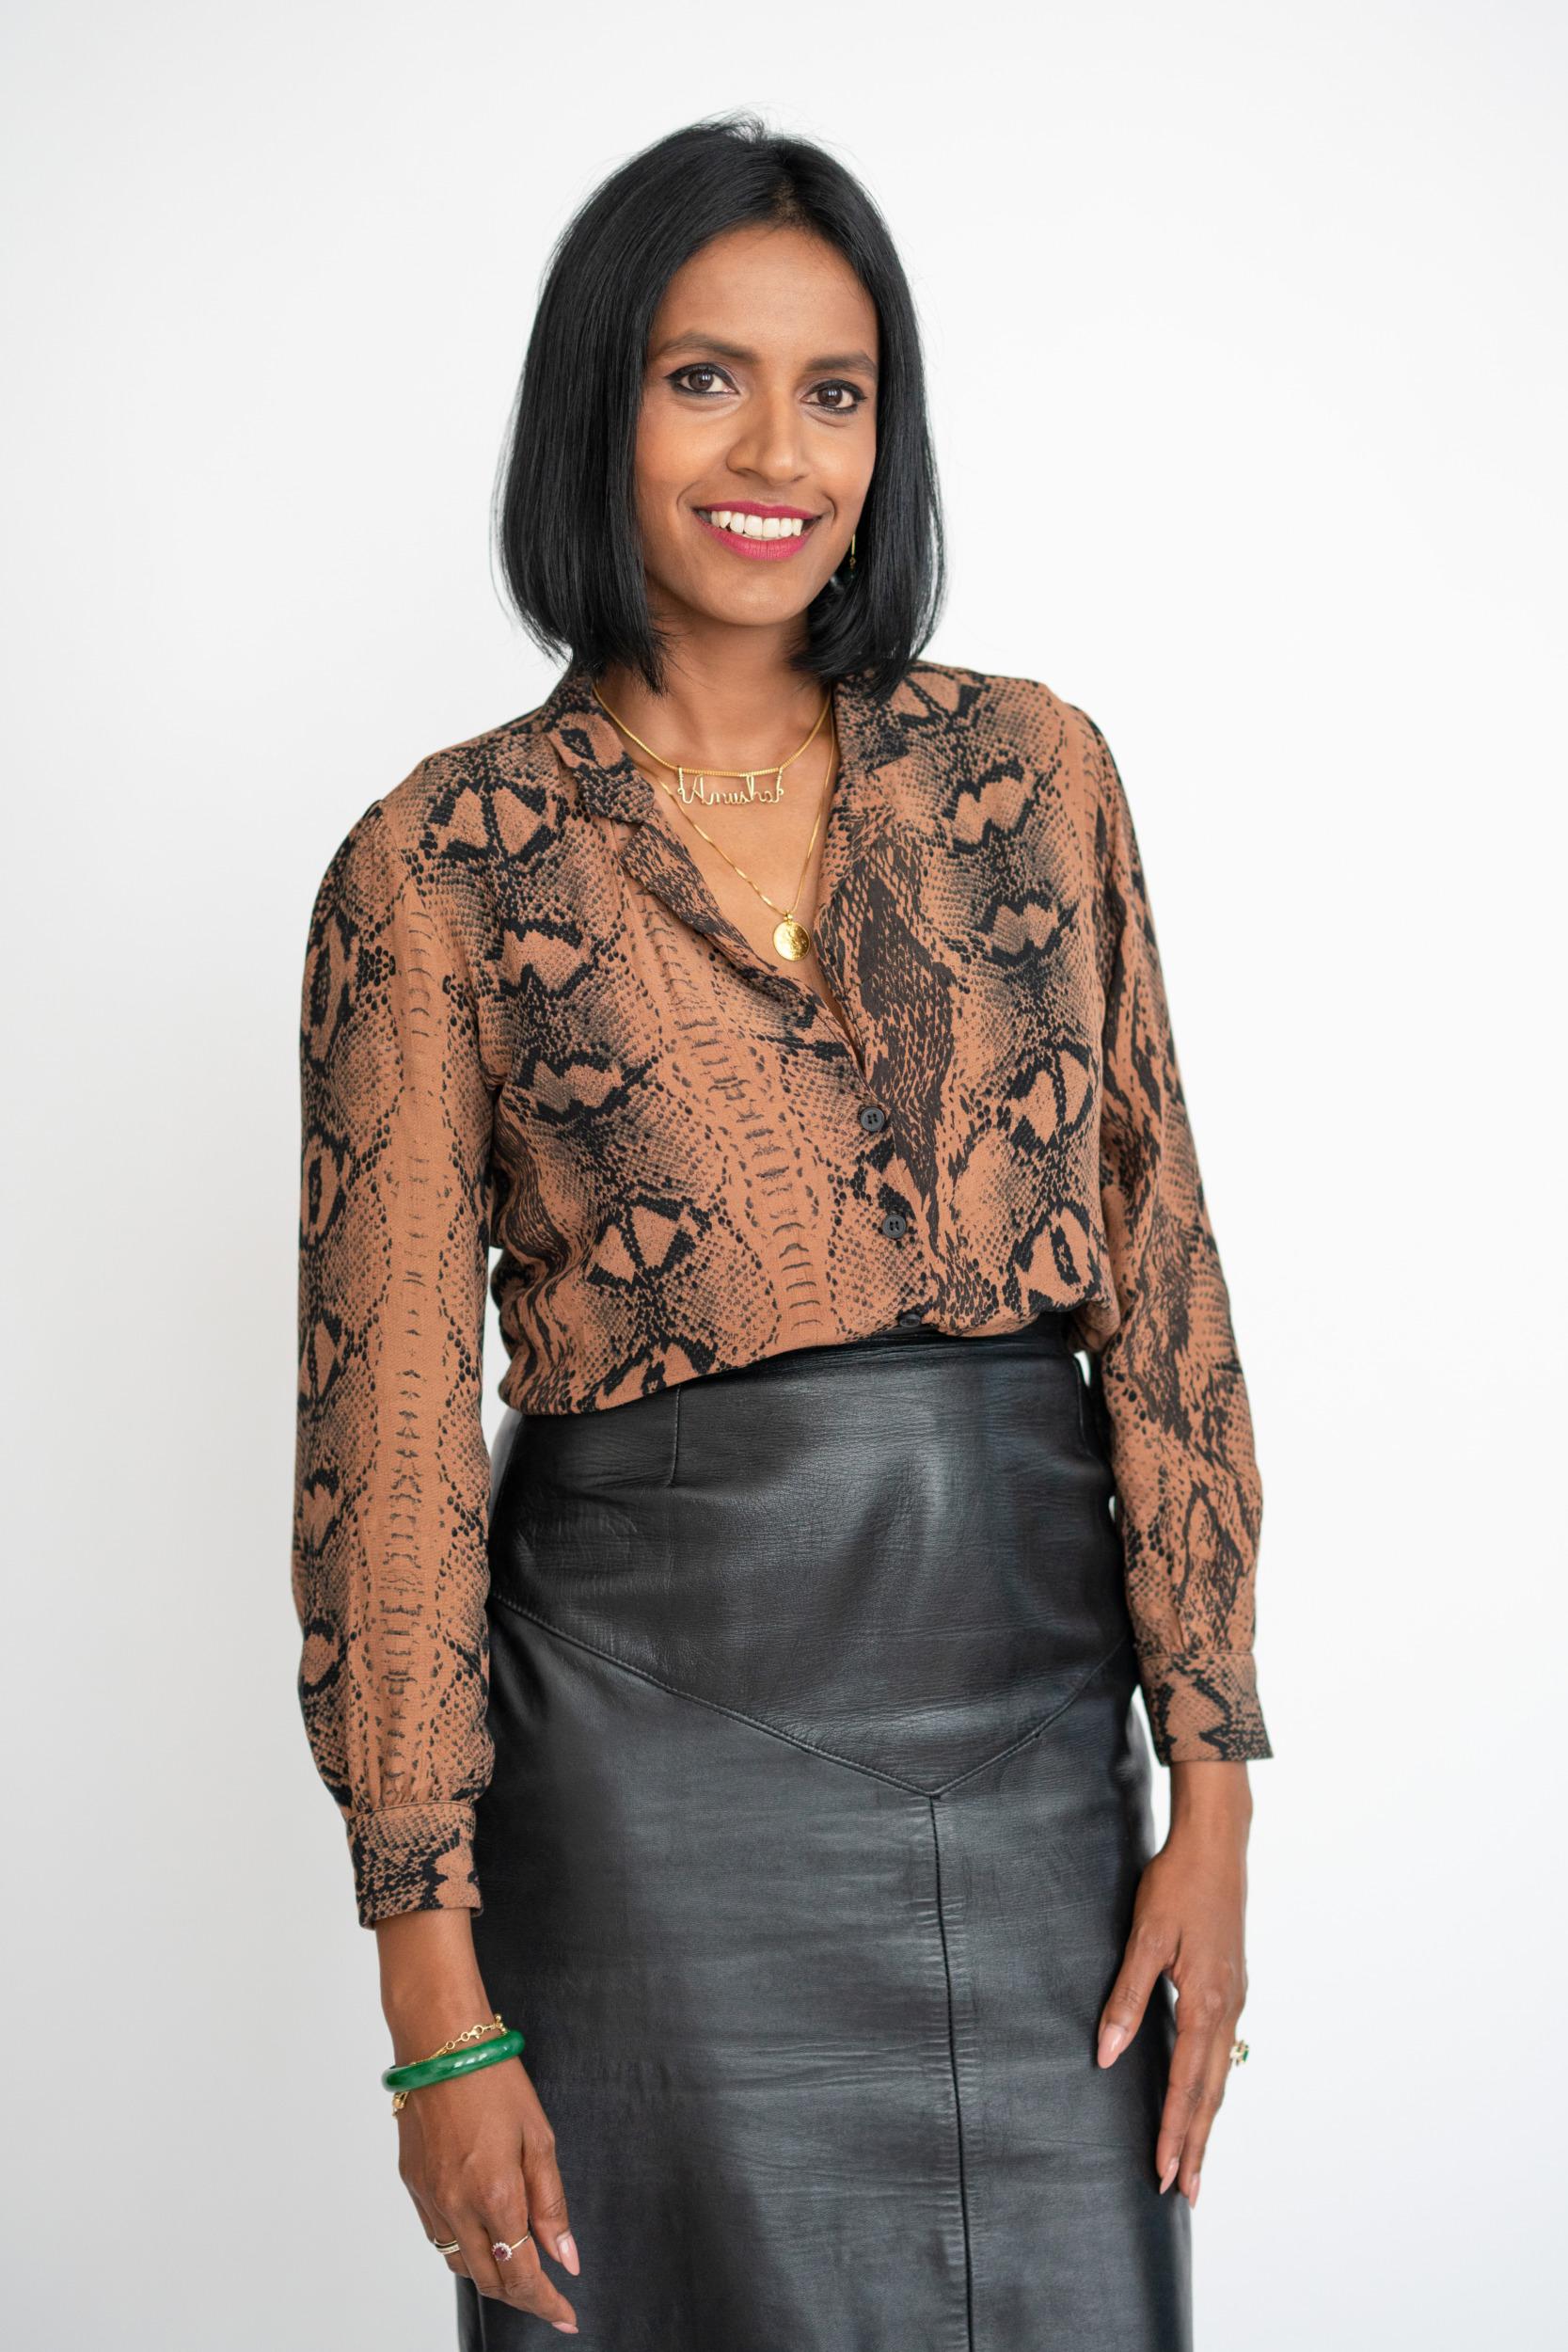 Anusha Wijeyakumar MA, CPC, Dip Mentoring, RYT